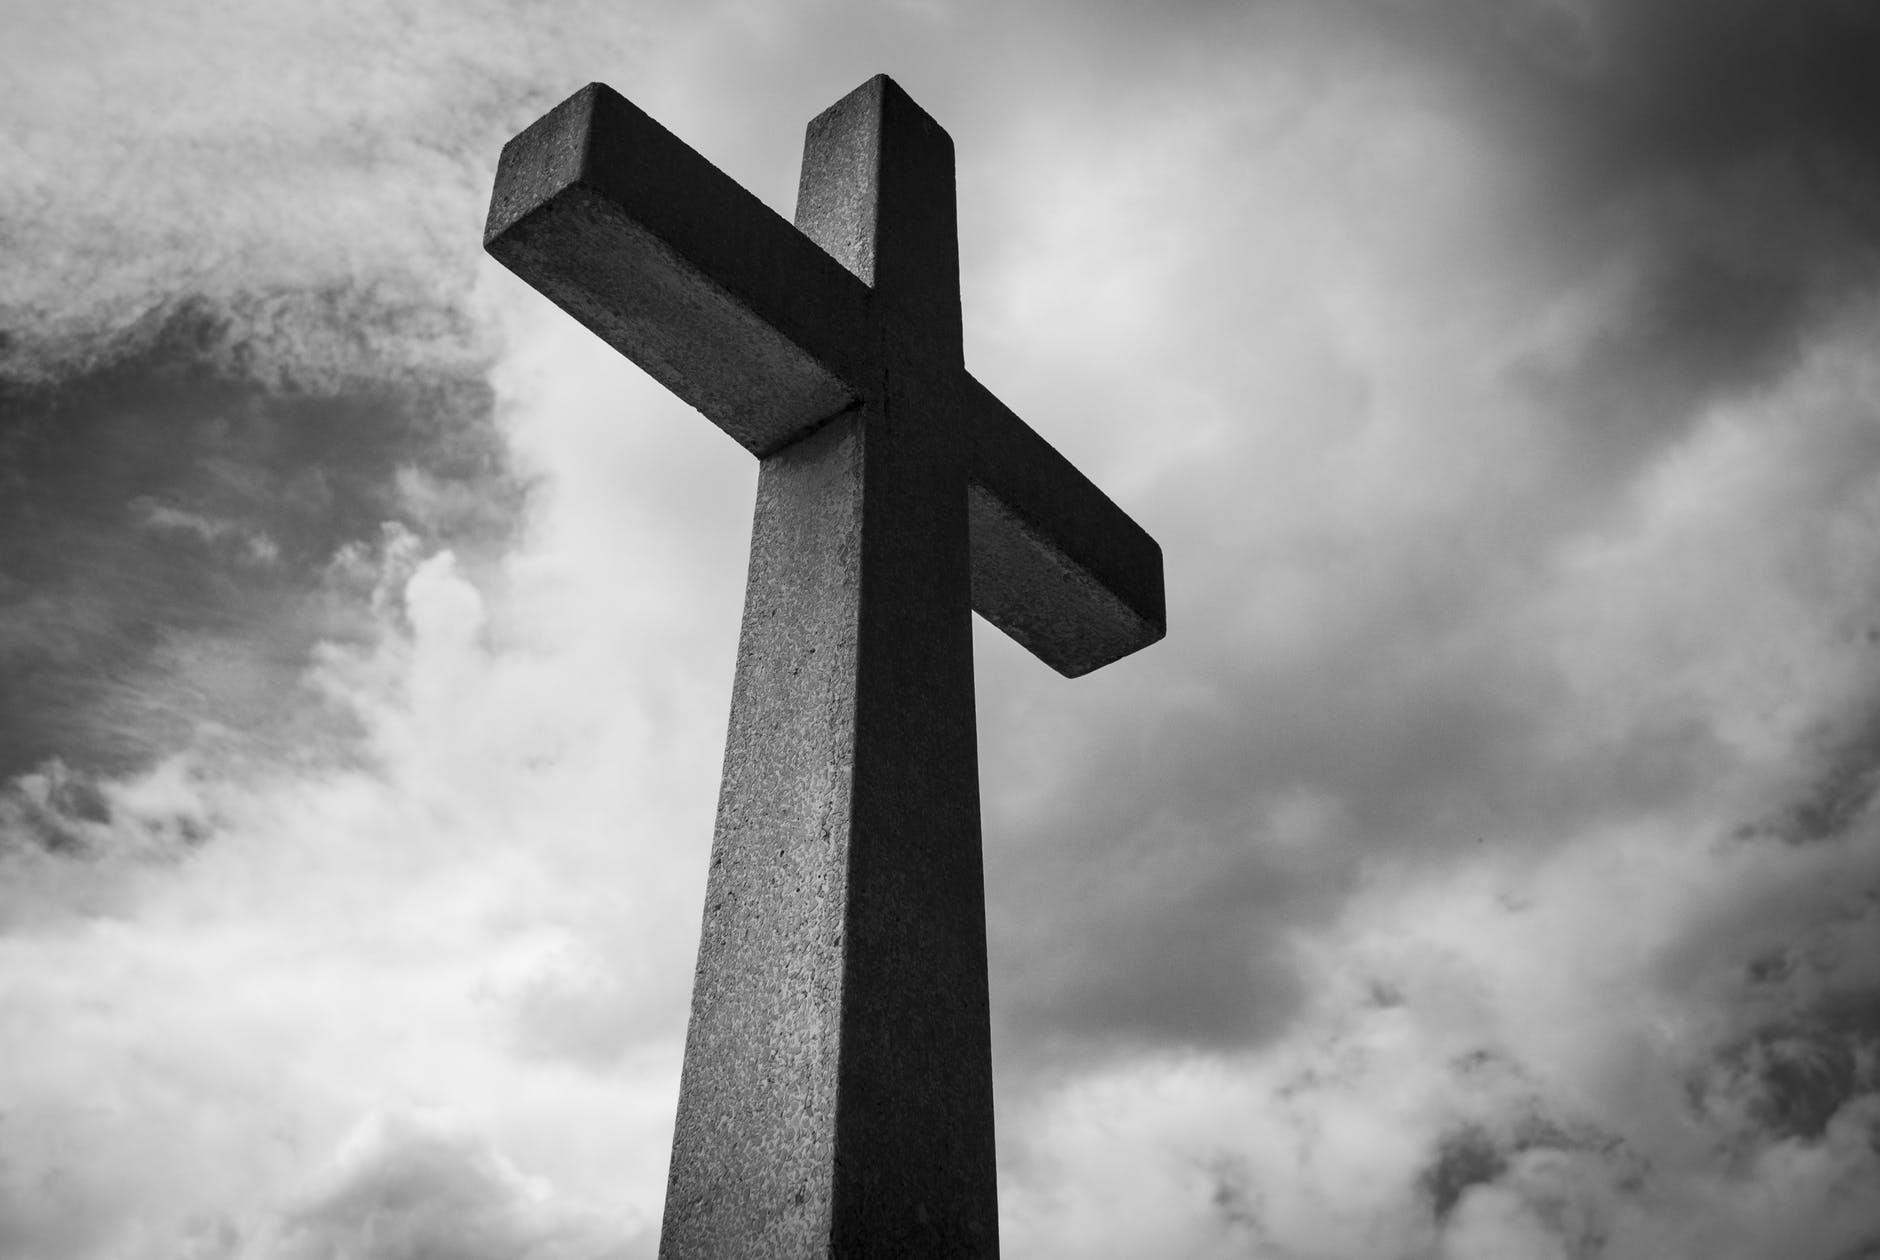 The Discipline of Church - Men of Destiny - pt 1